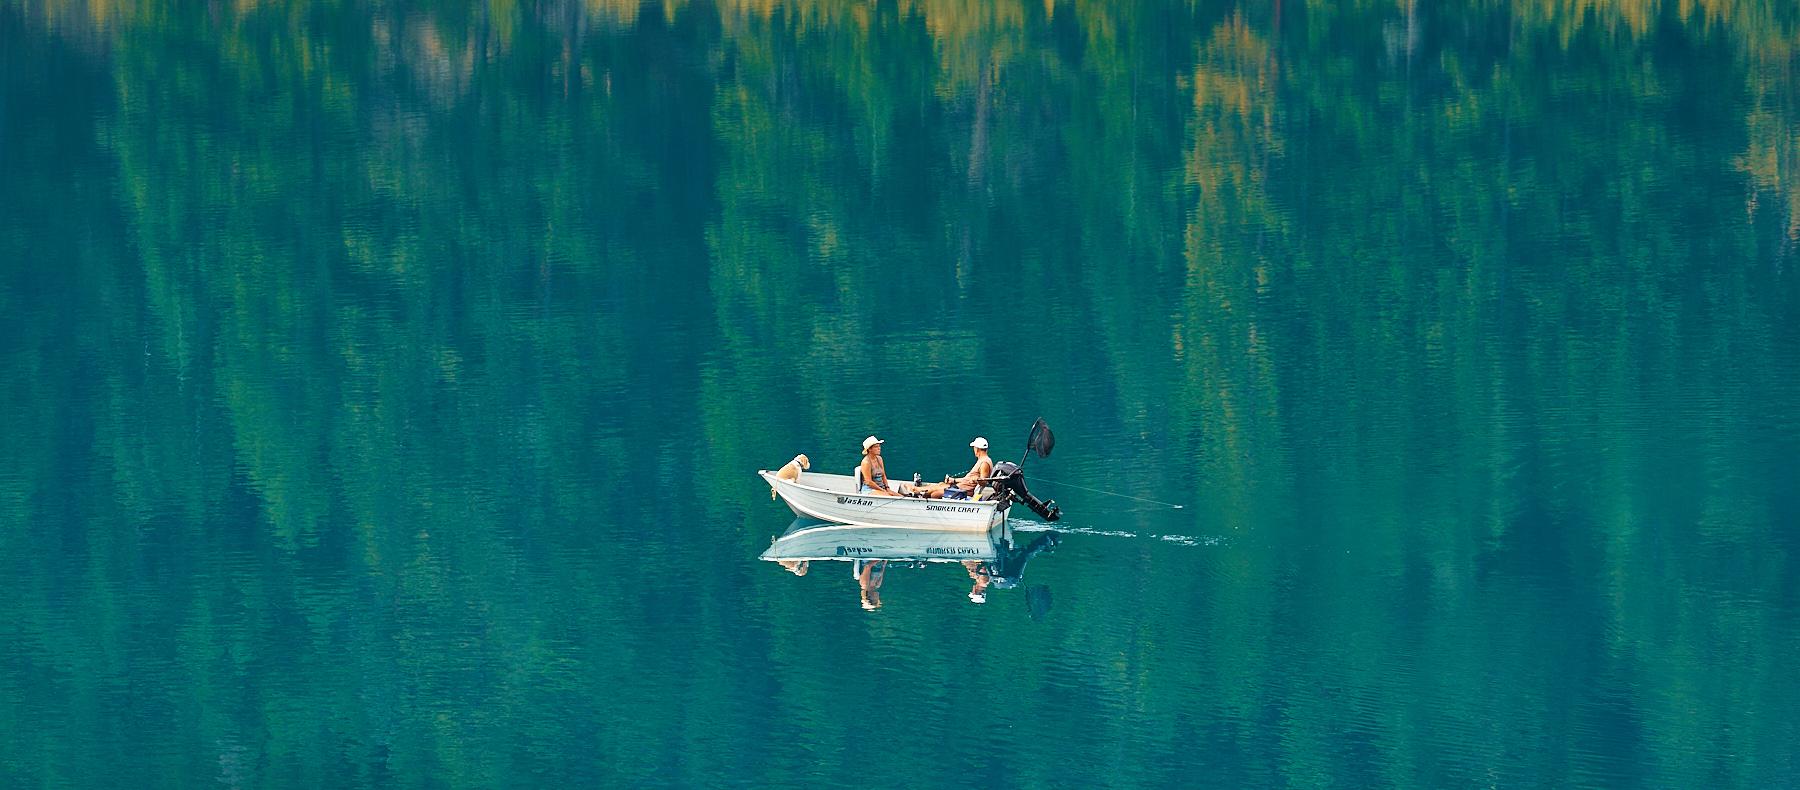 Greens of Alleyne Lake near Merritt BC © johncameron.ca